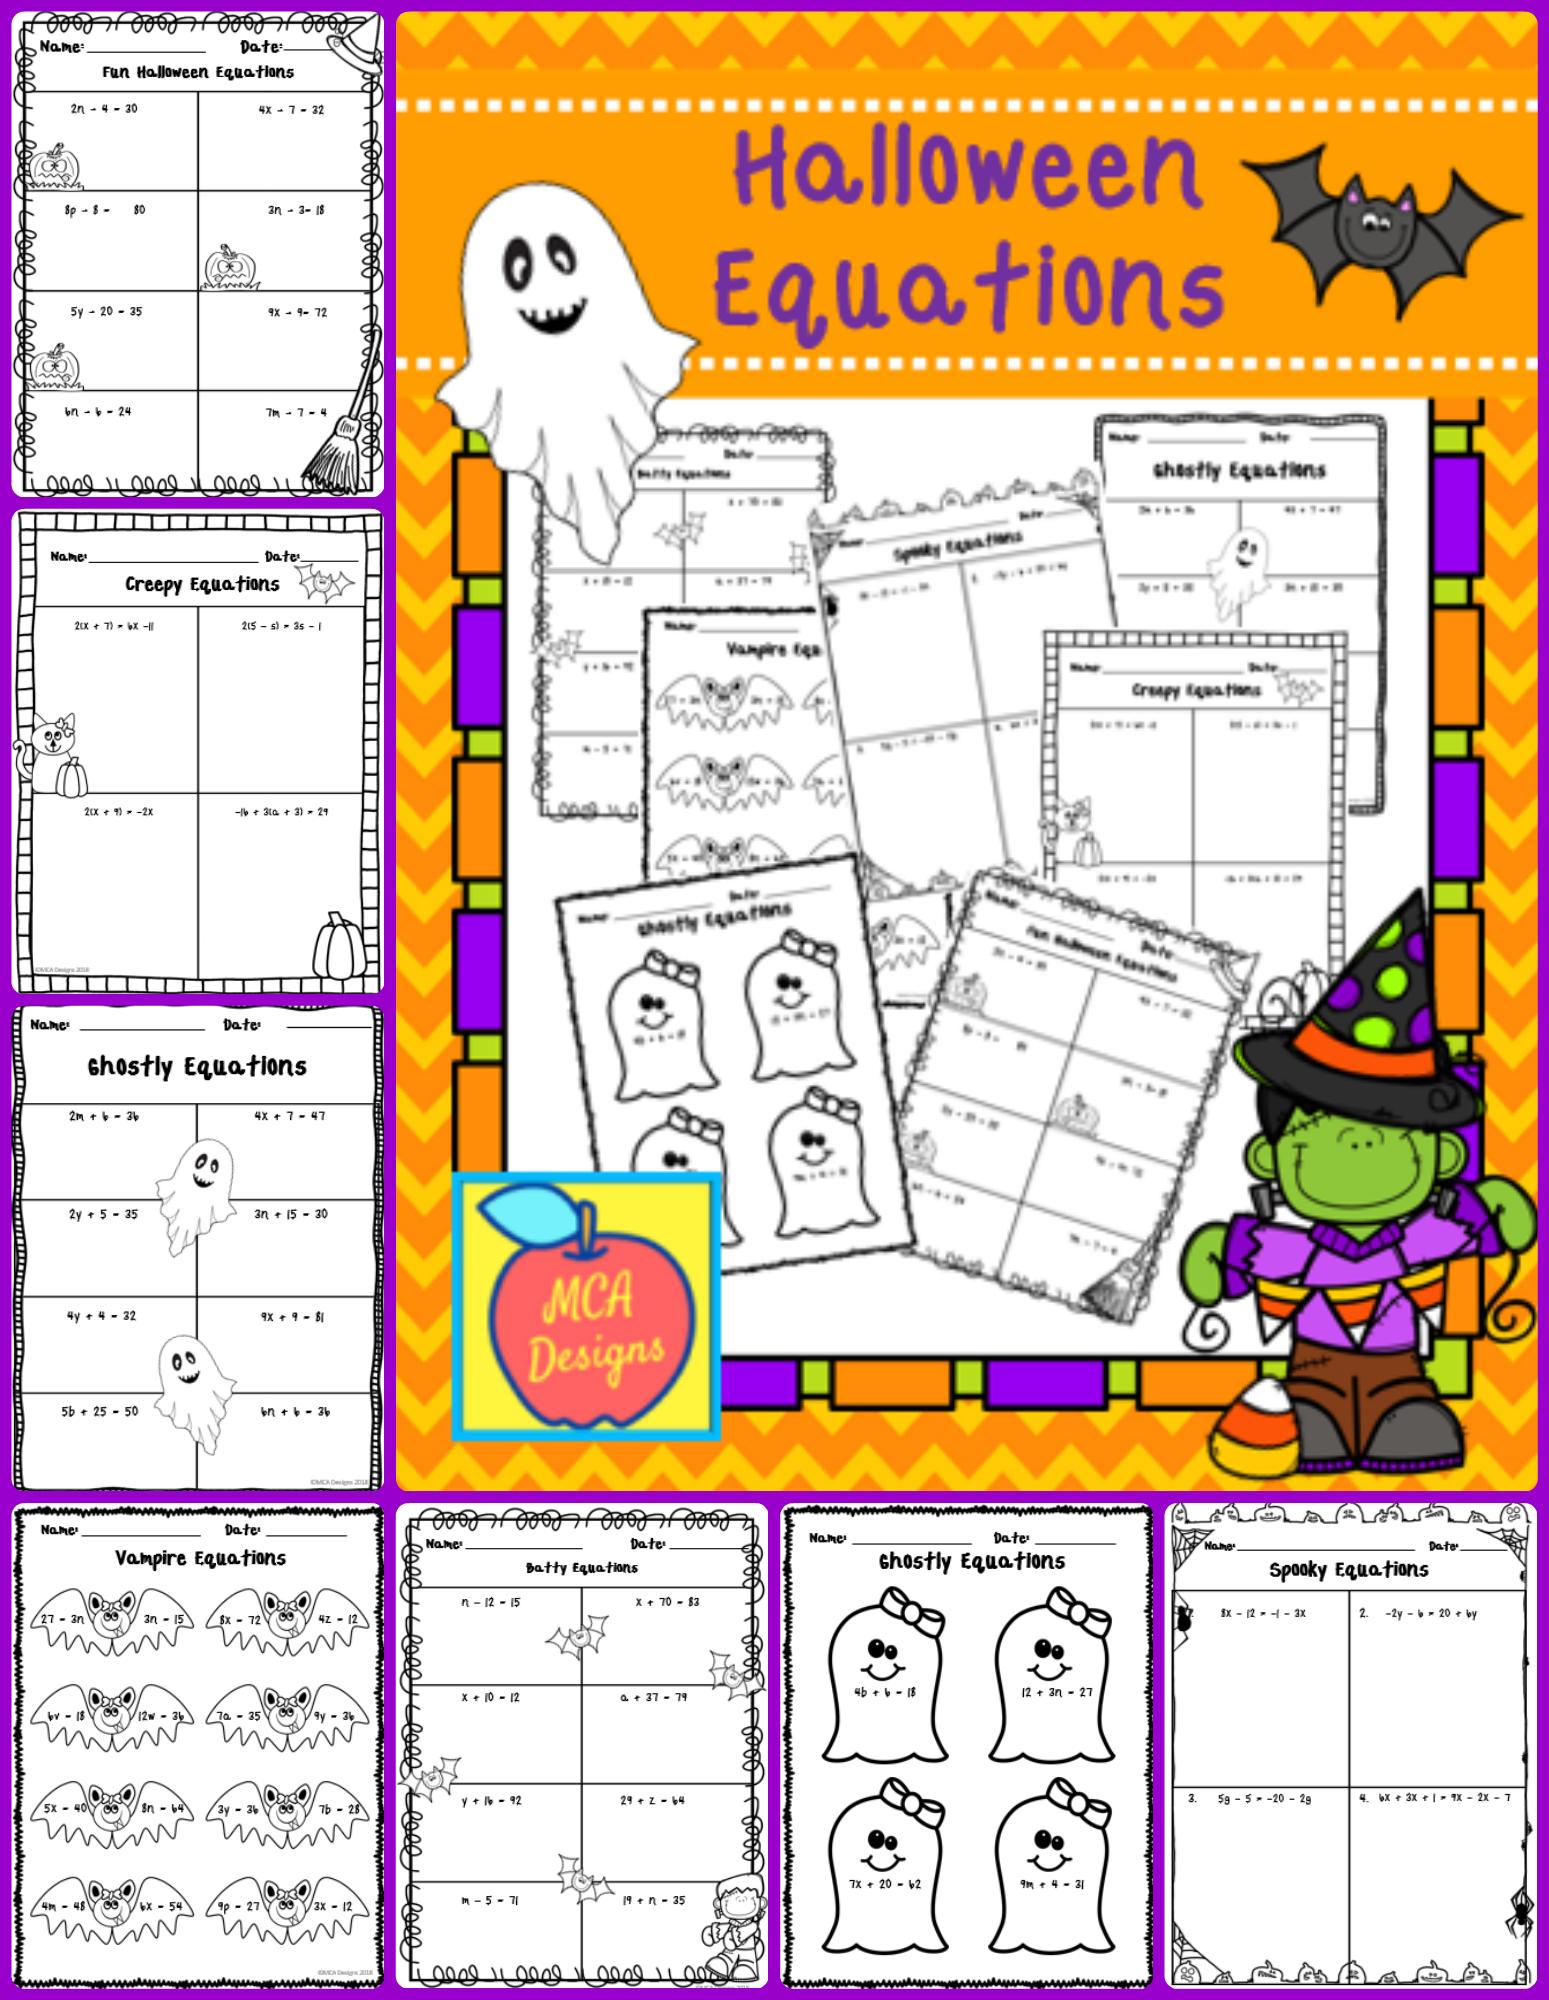 Halloween Equations October